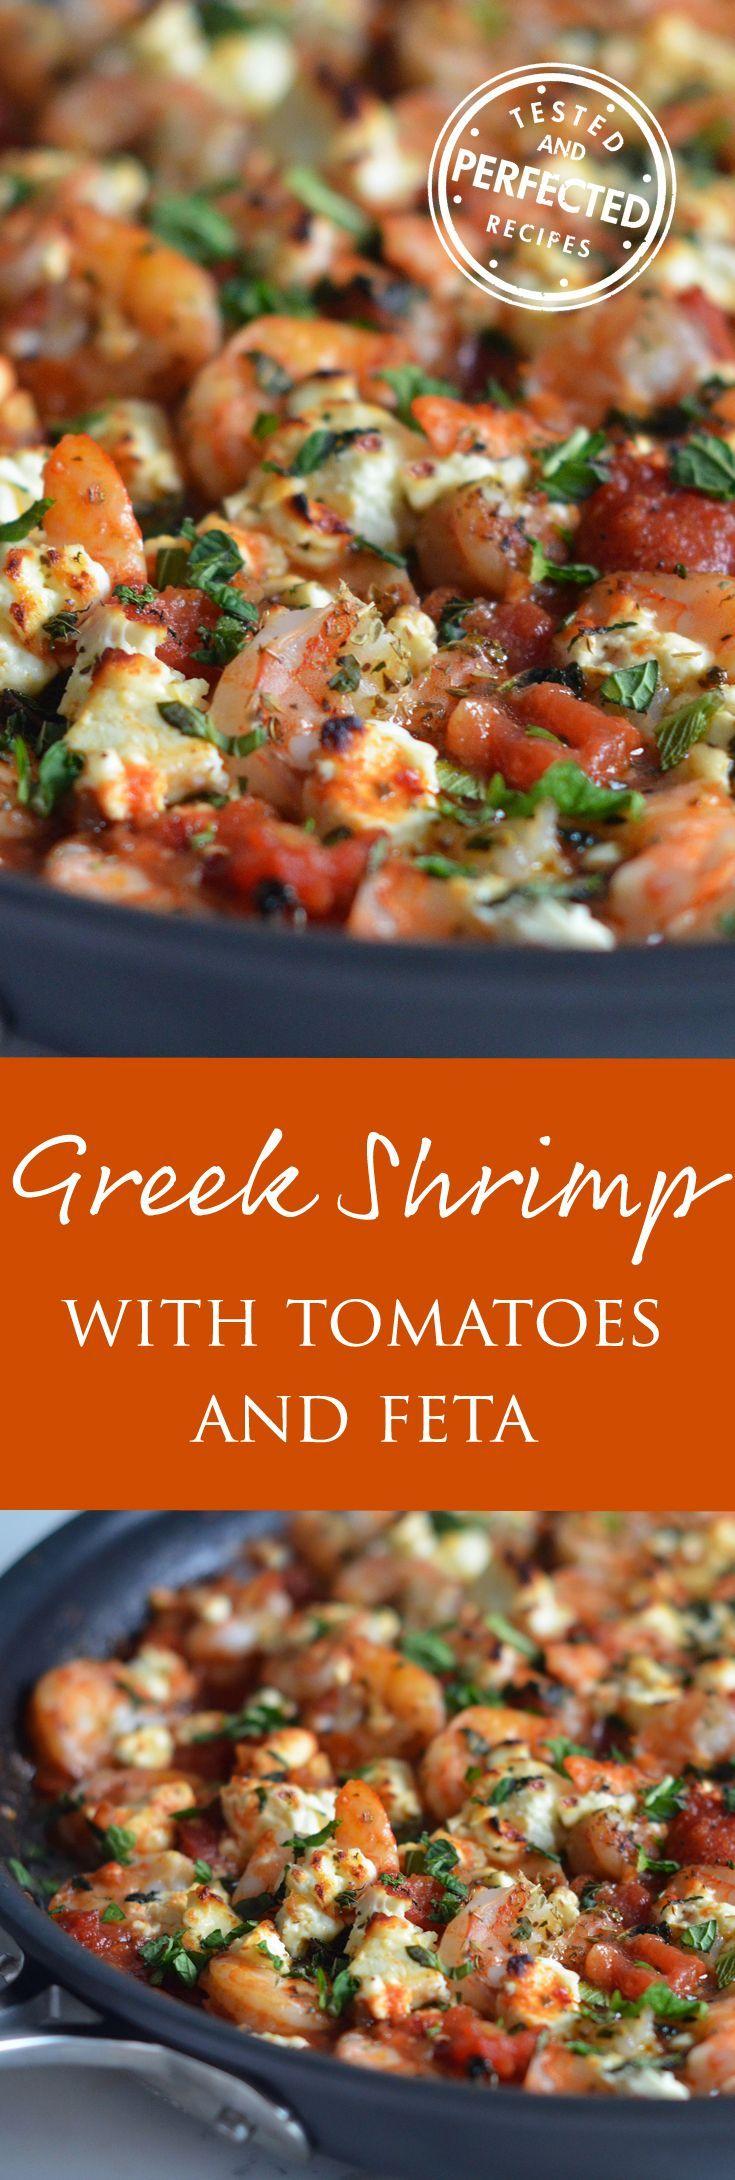 Greek Shrimp with Tomatoes & Feta